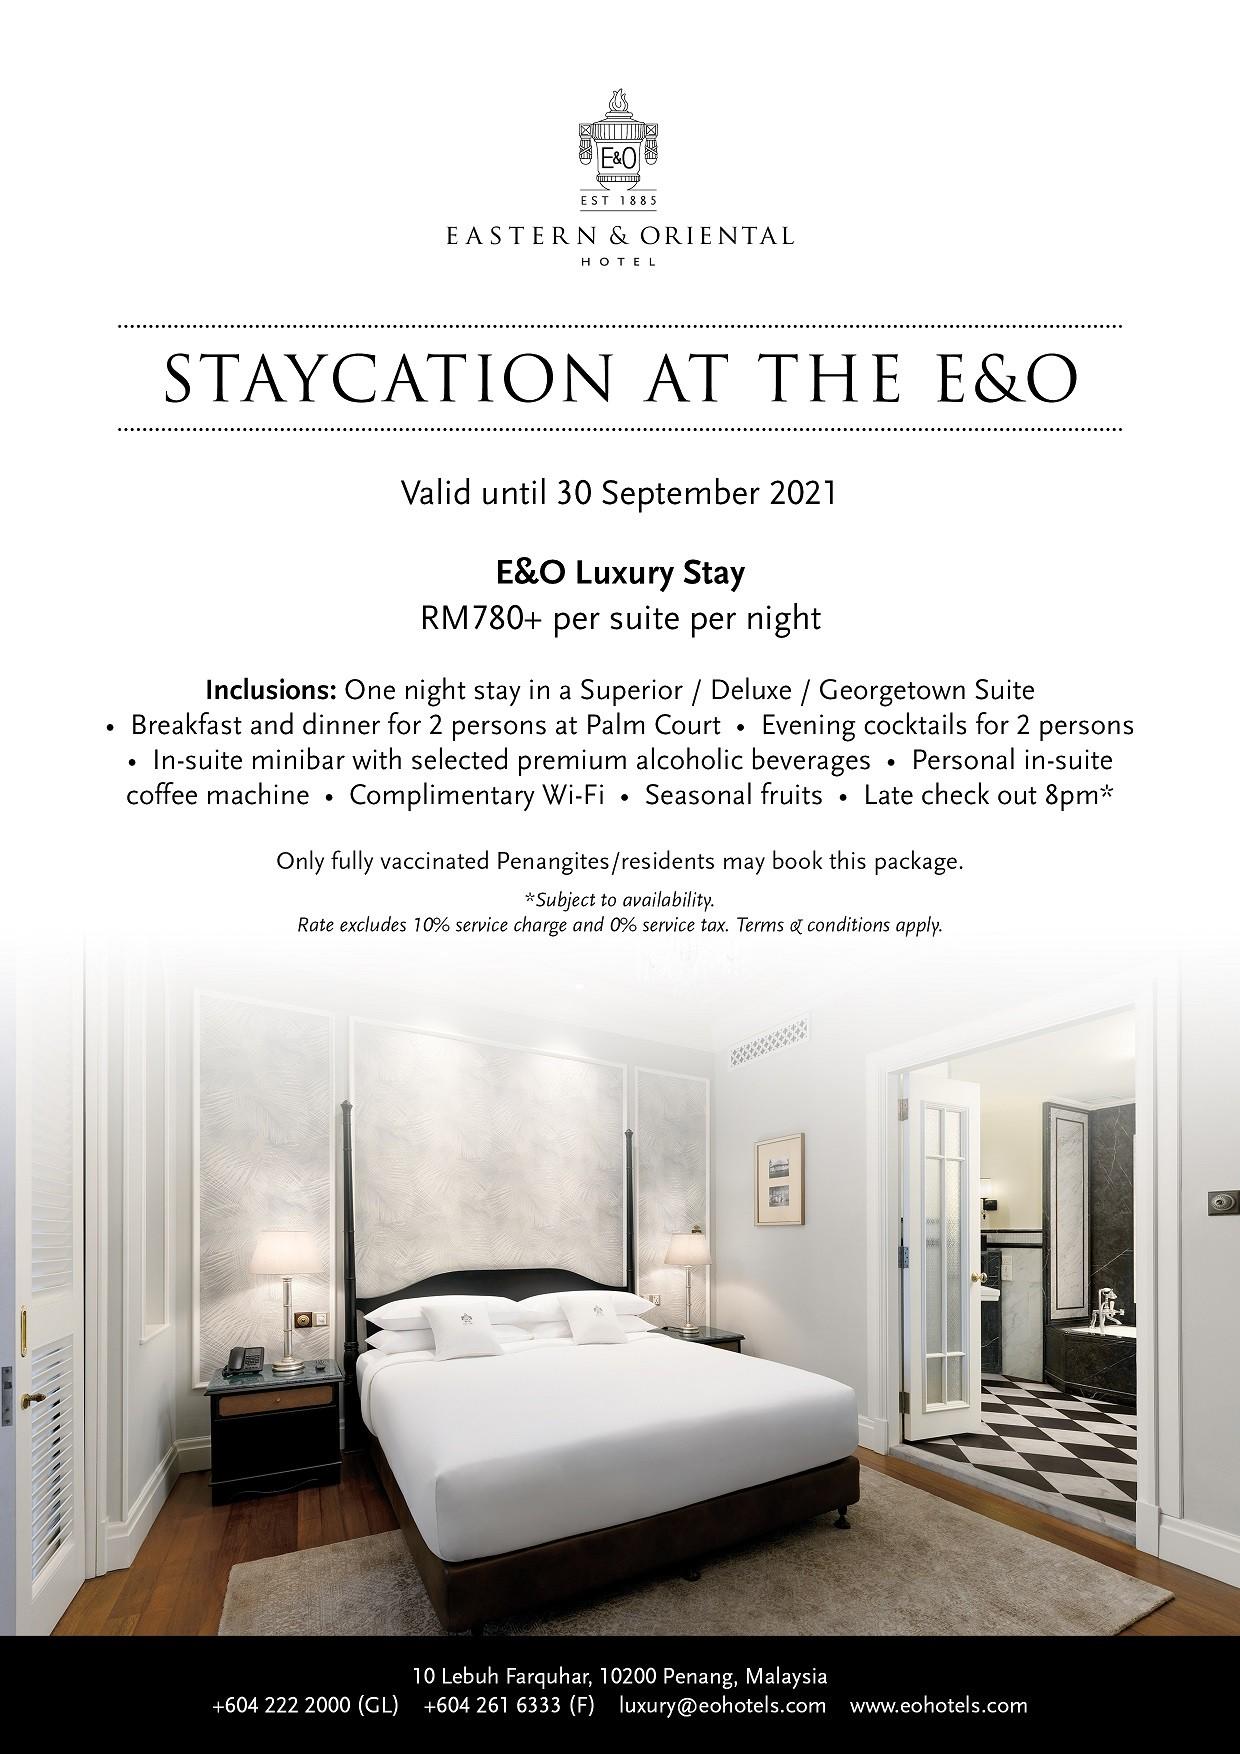 E&O Luxury Stay